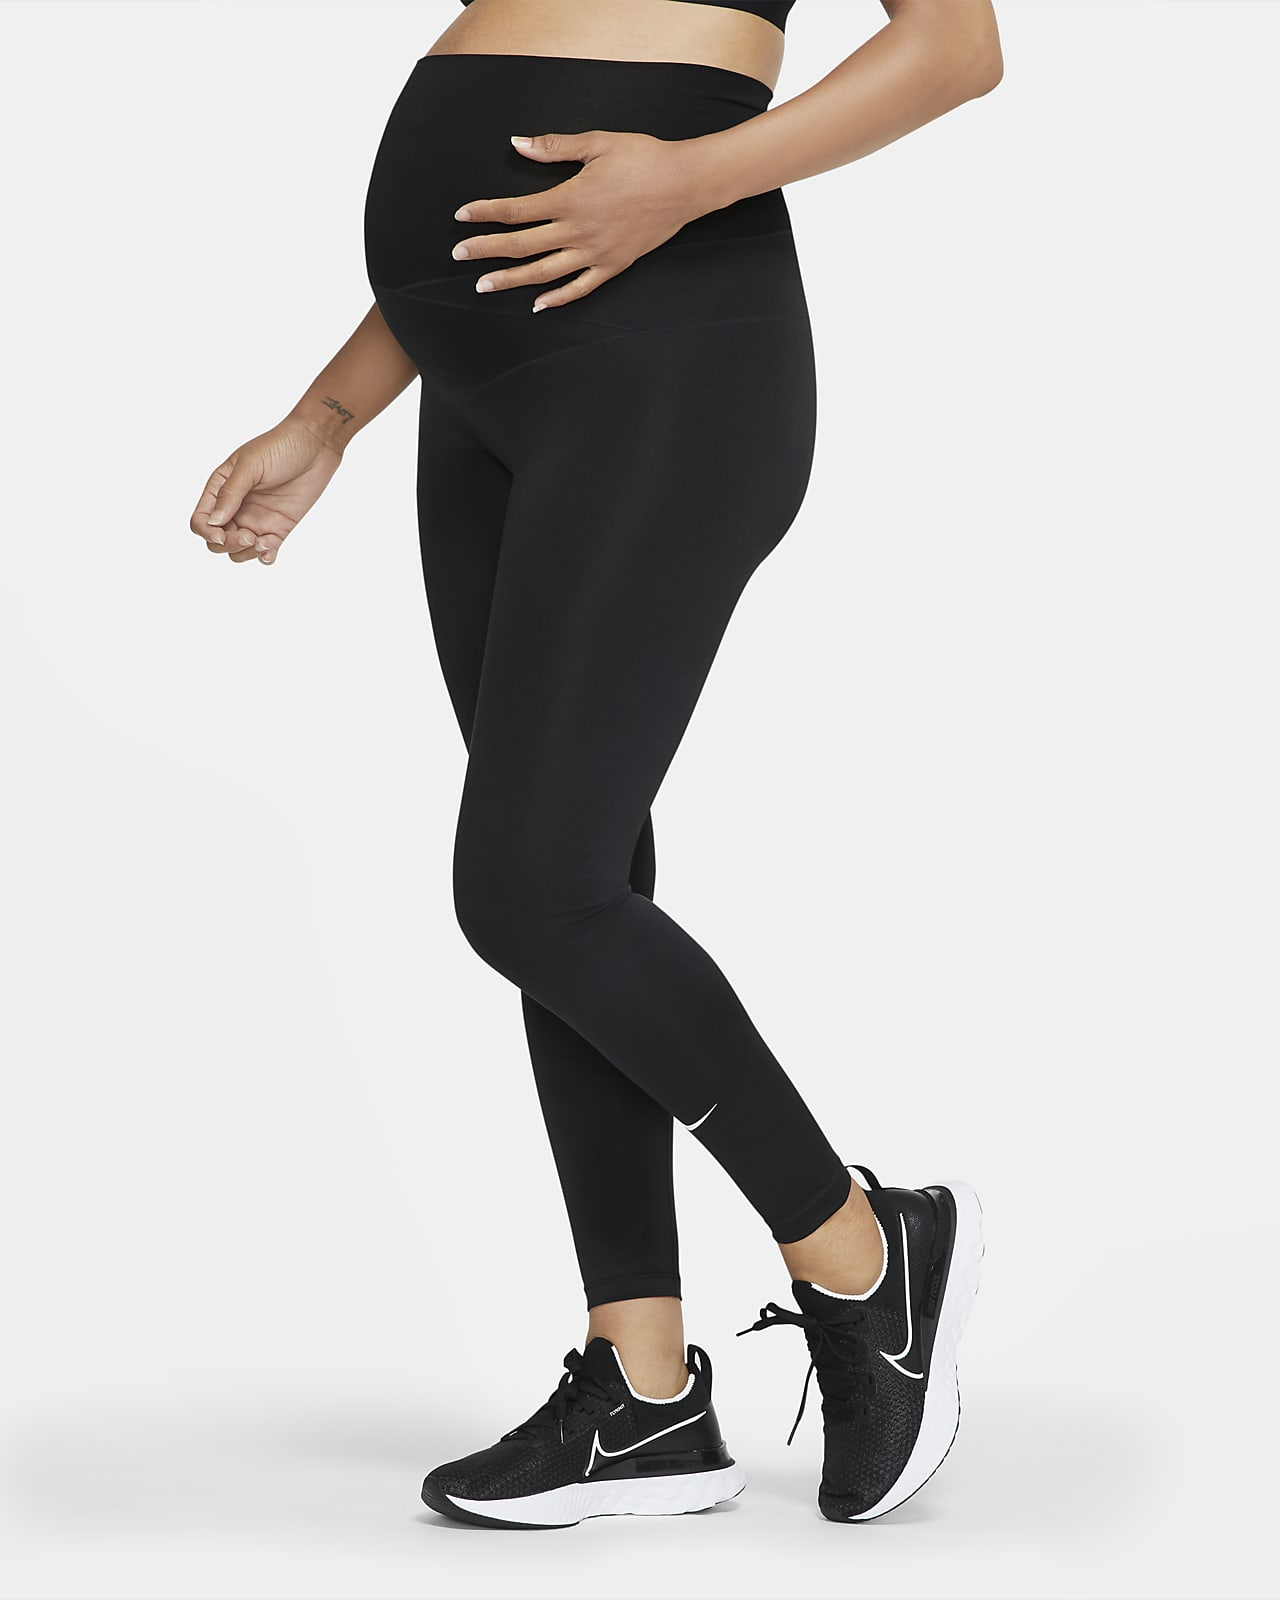 Nike One-leggings (M) til kvinder (graviditet)